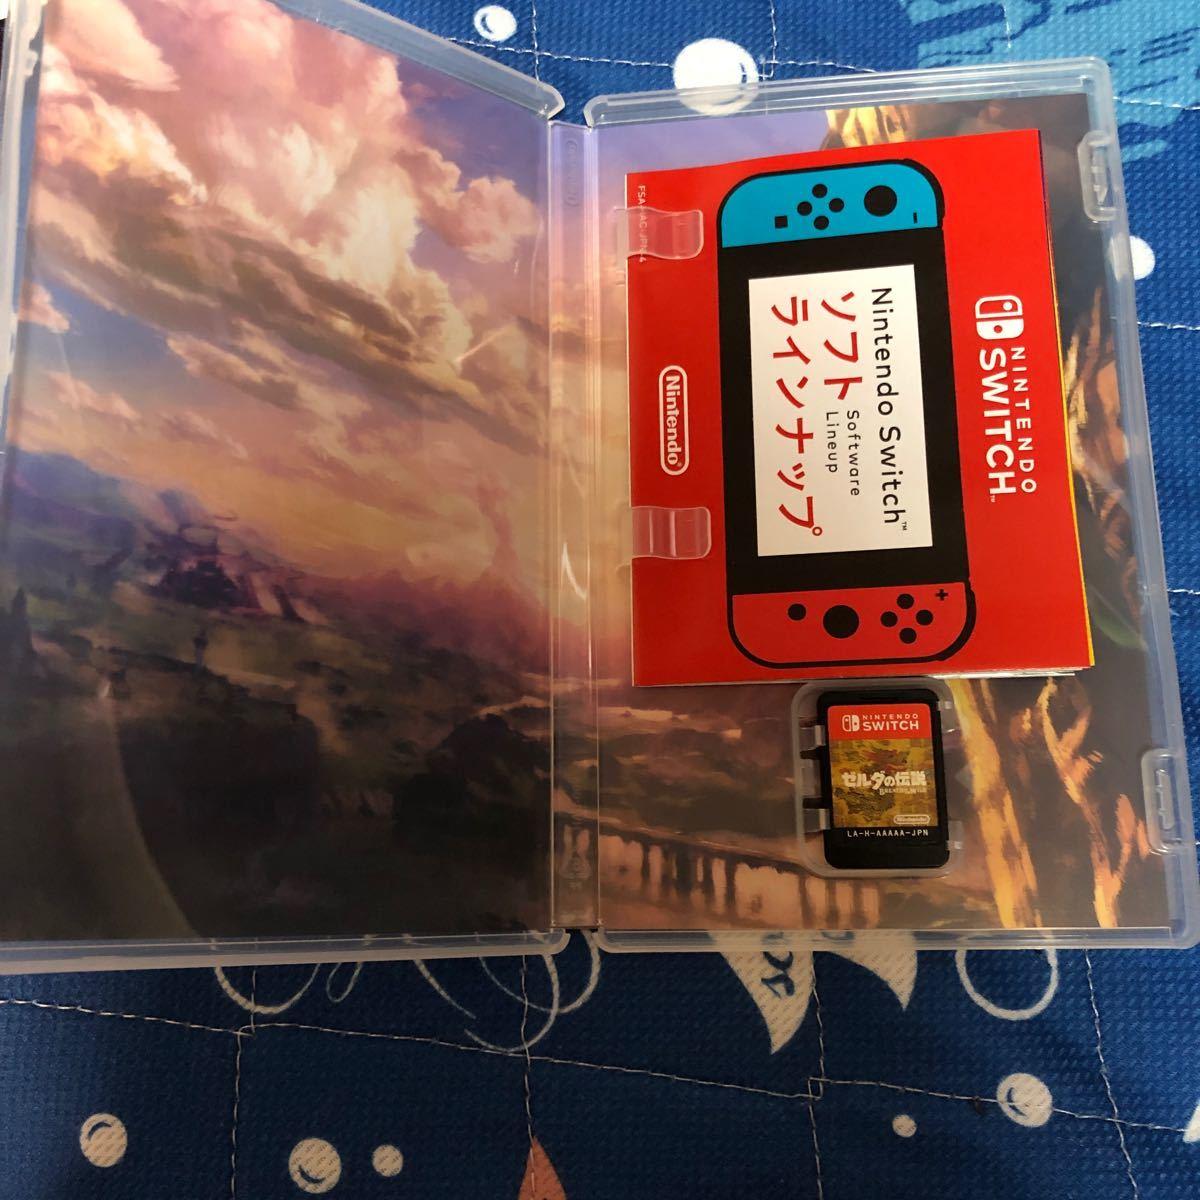 【Switch】 ゼルダの伝説 ブレス オブ ザ ワイルド [冒険ガイドブック付き]